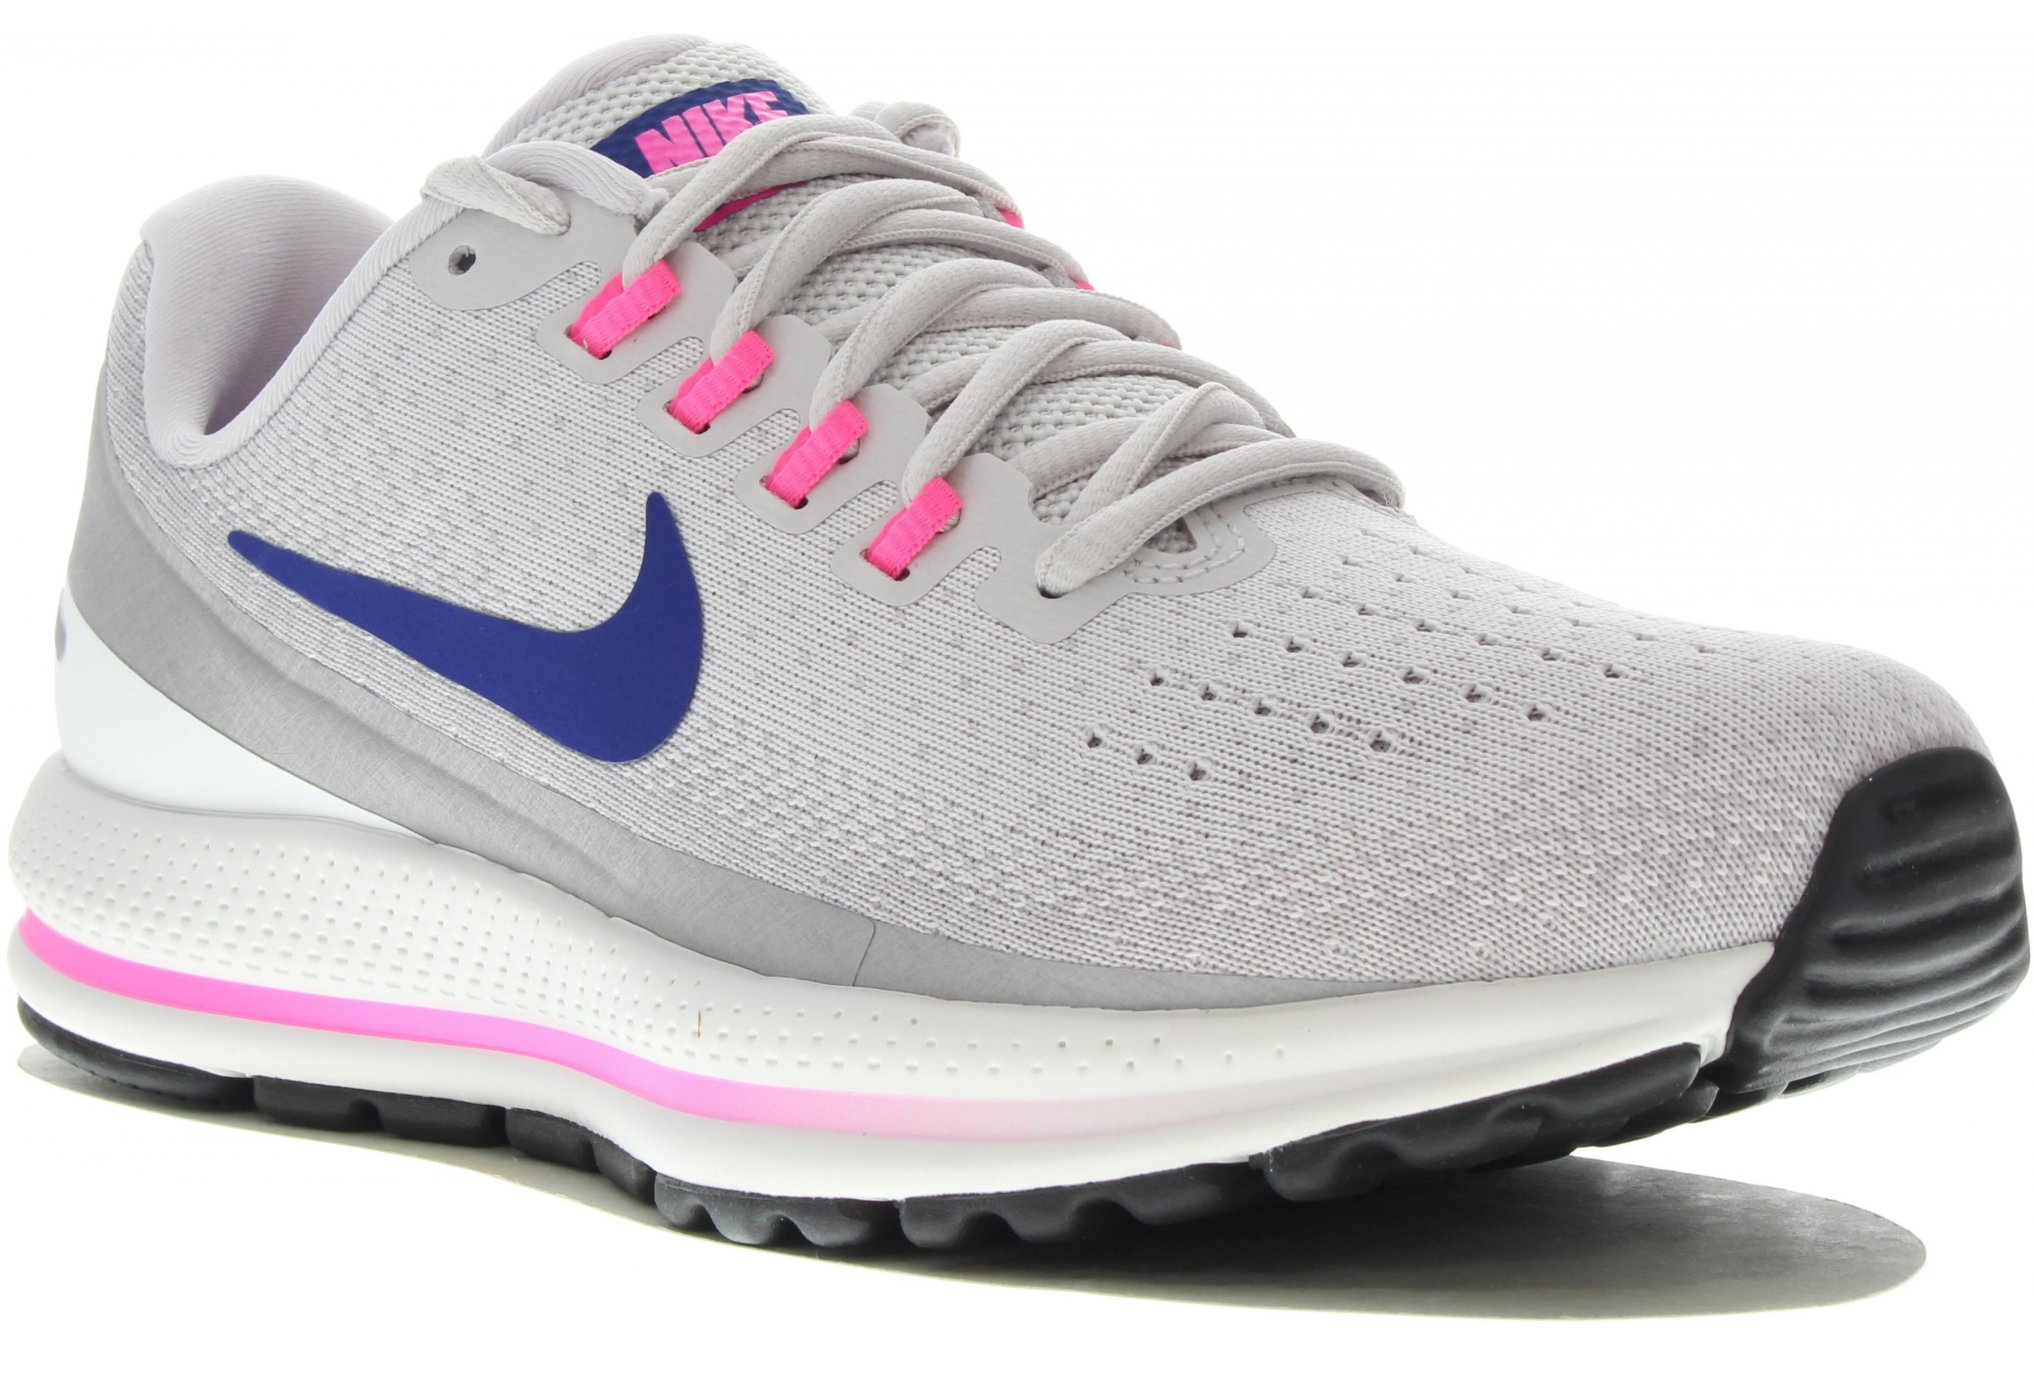 Nike Air Zoom Vomero 13 Chaussures running femme